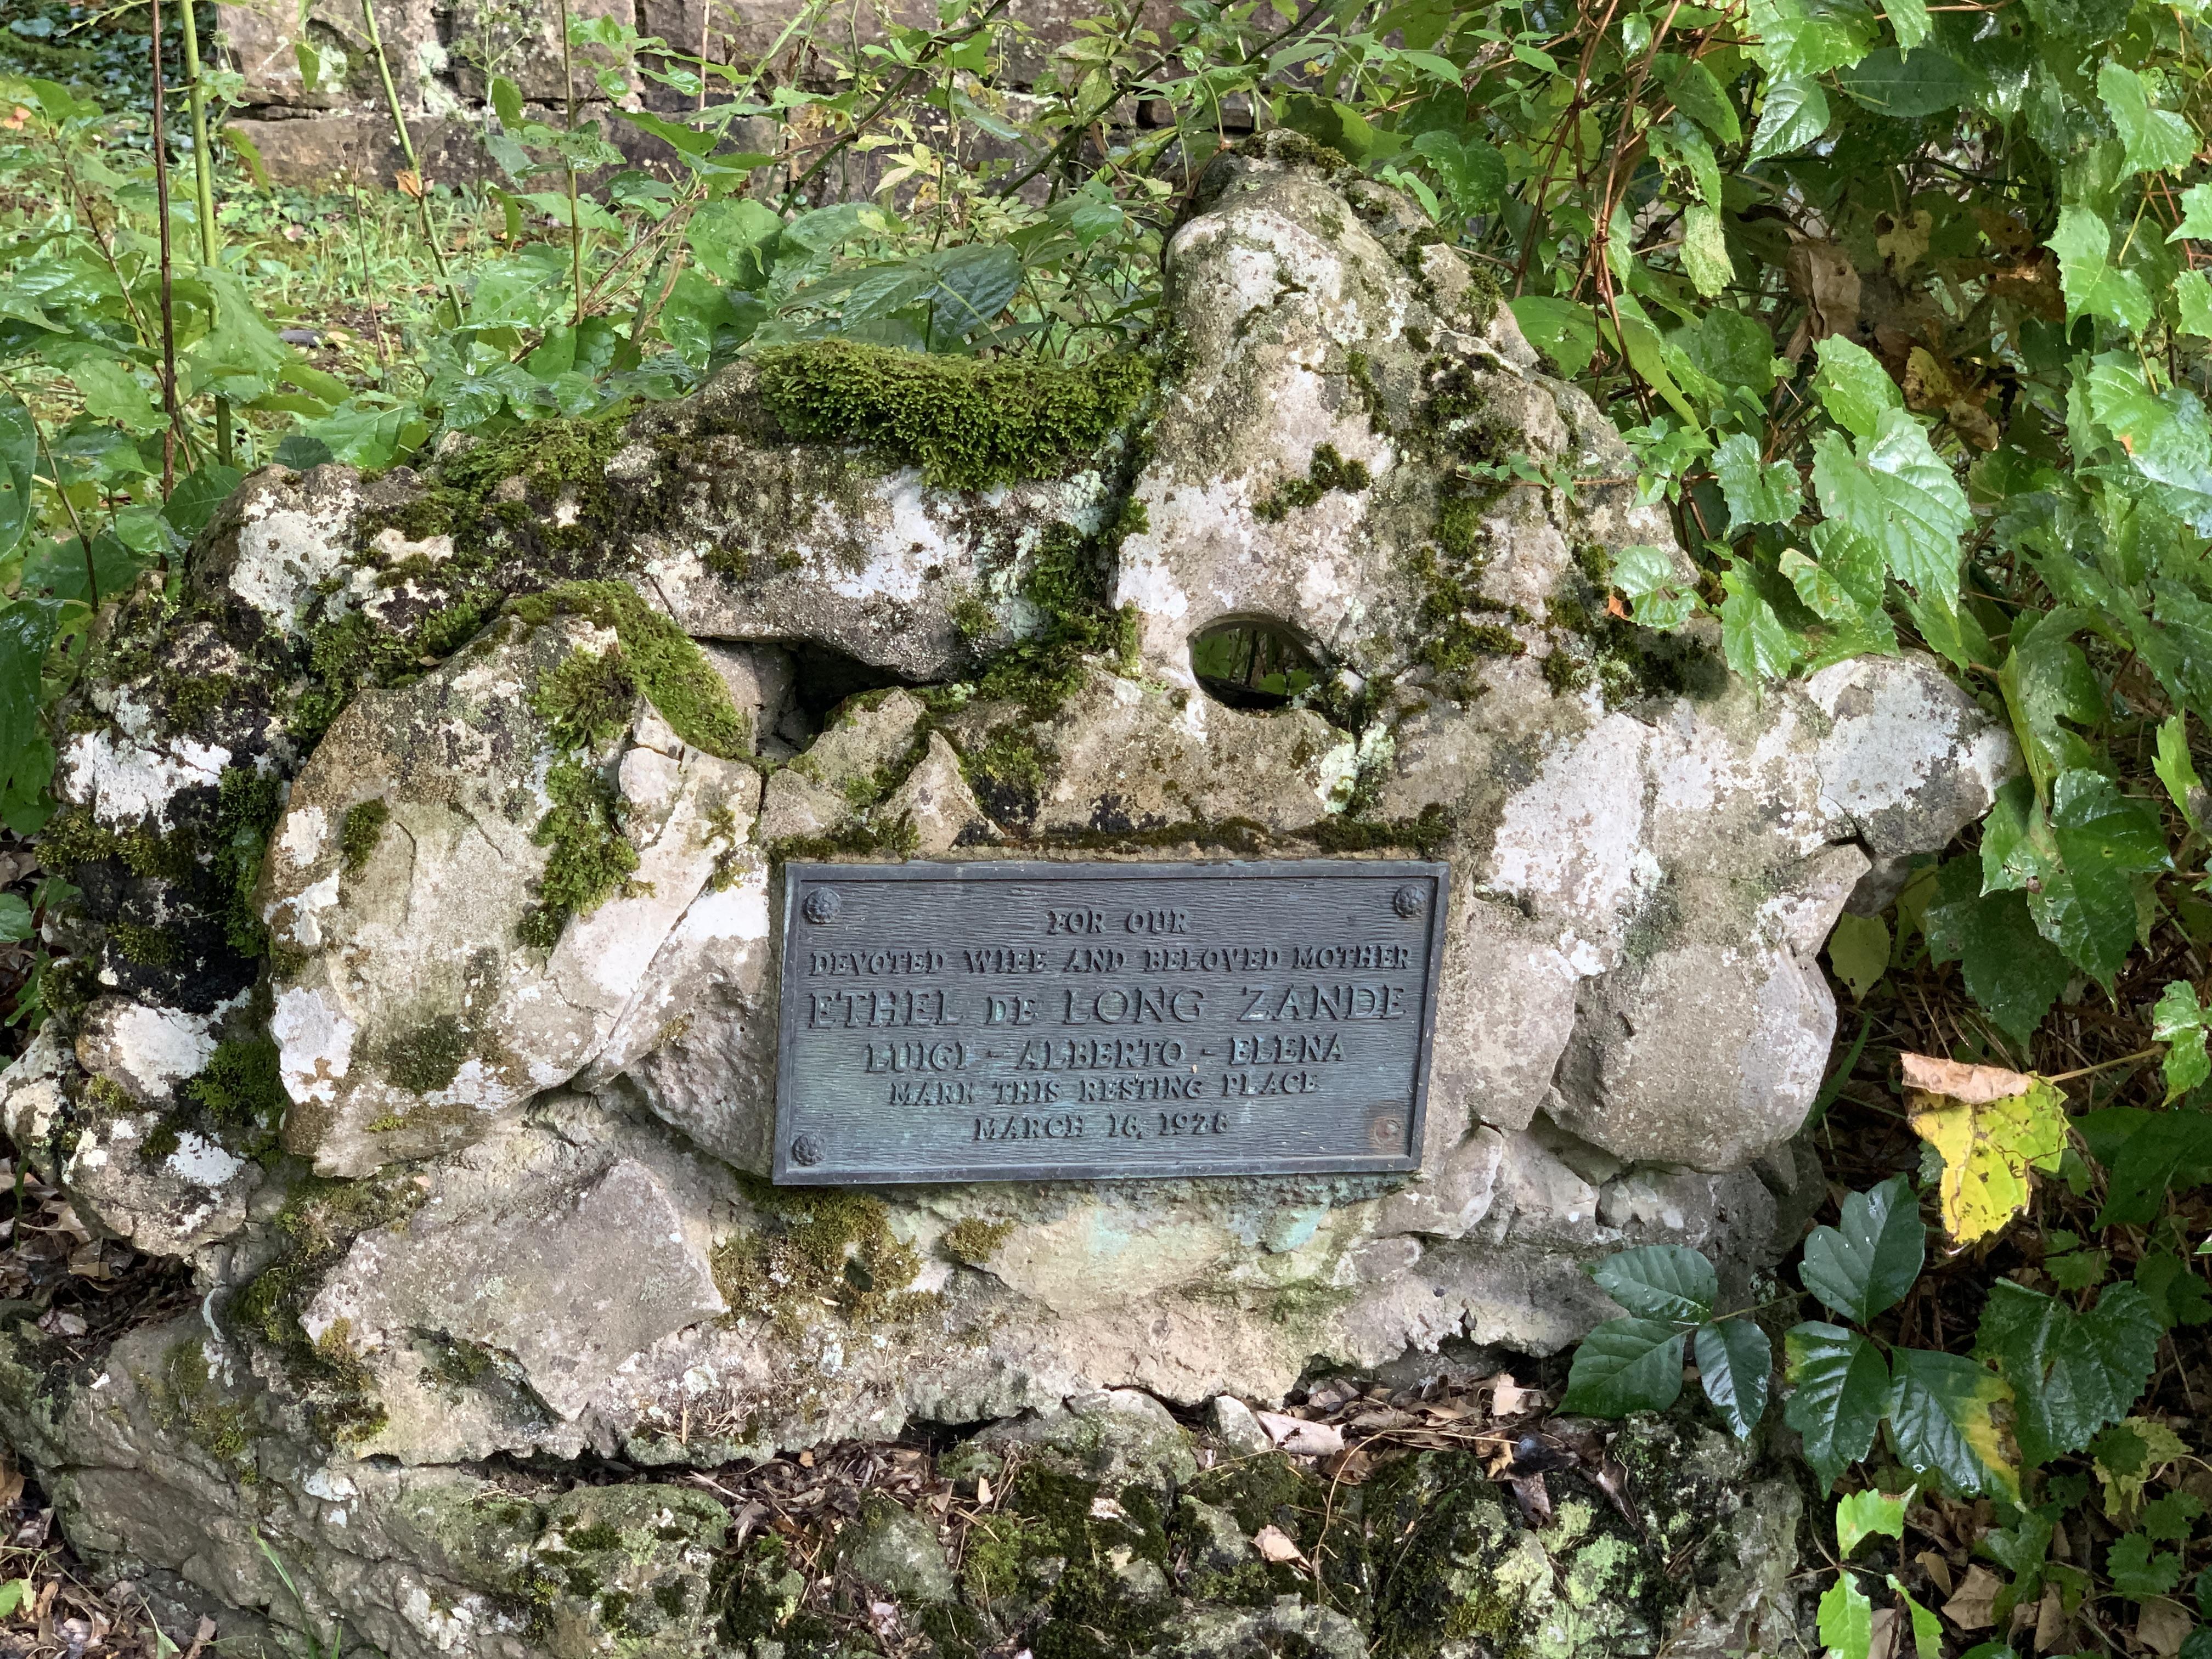 Grave marker for Ethel de Long Zande. March 16, 1928.